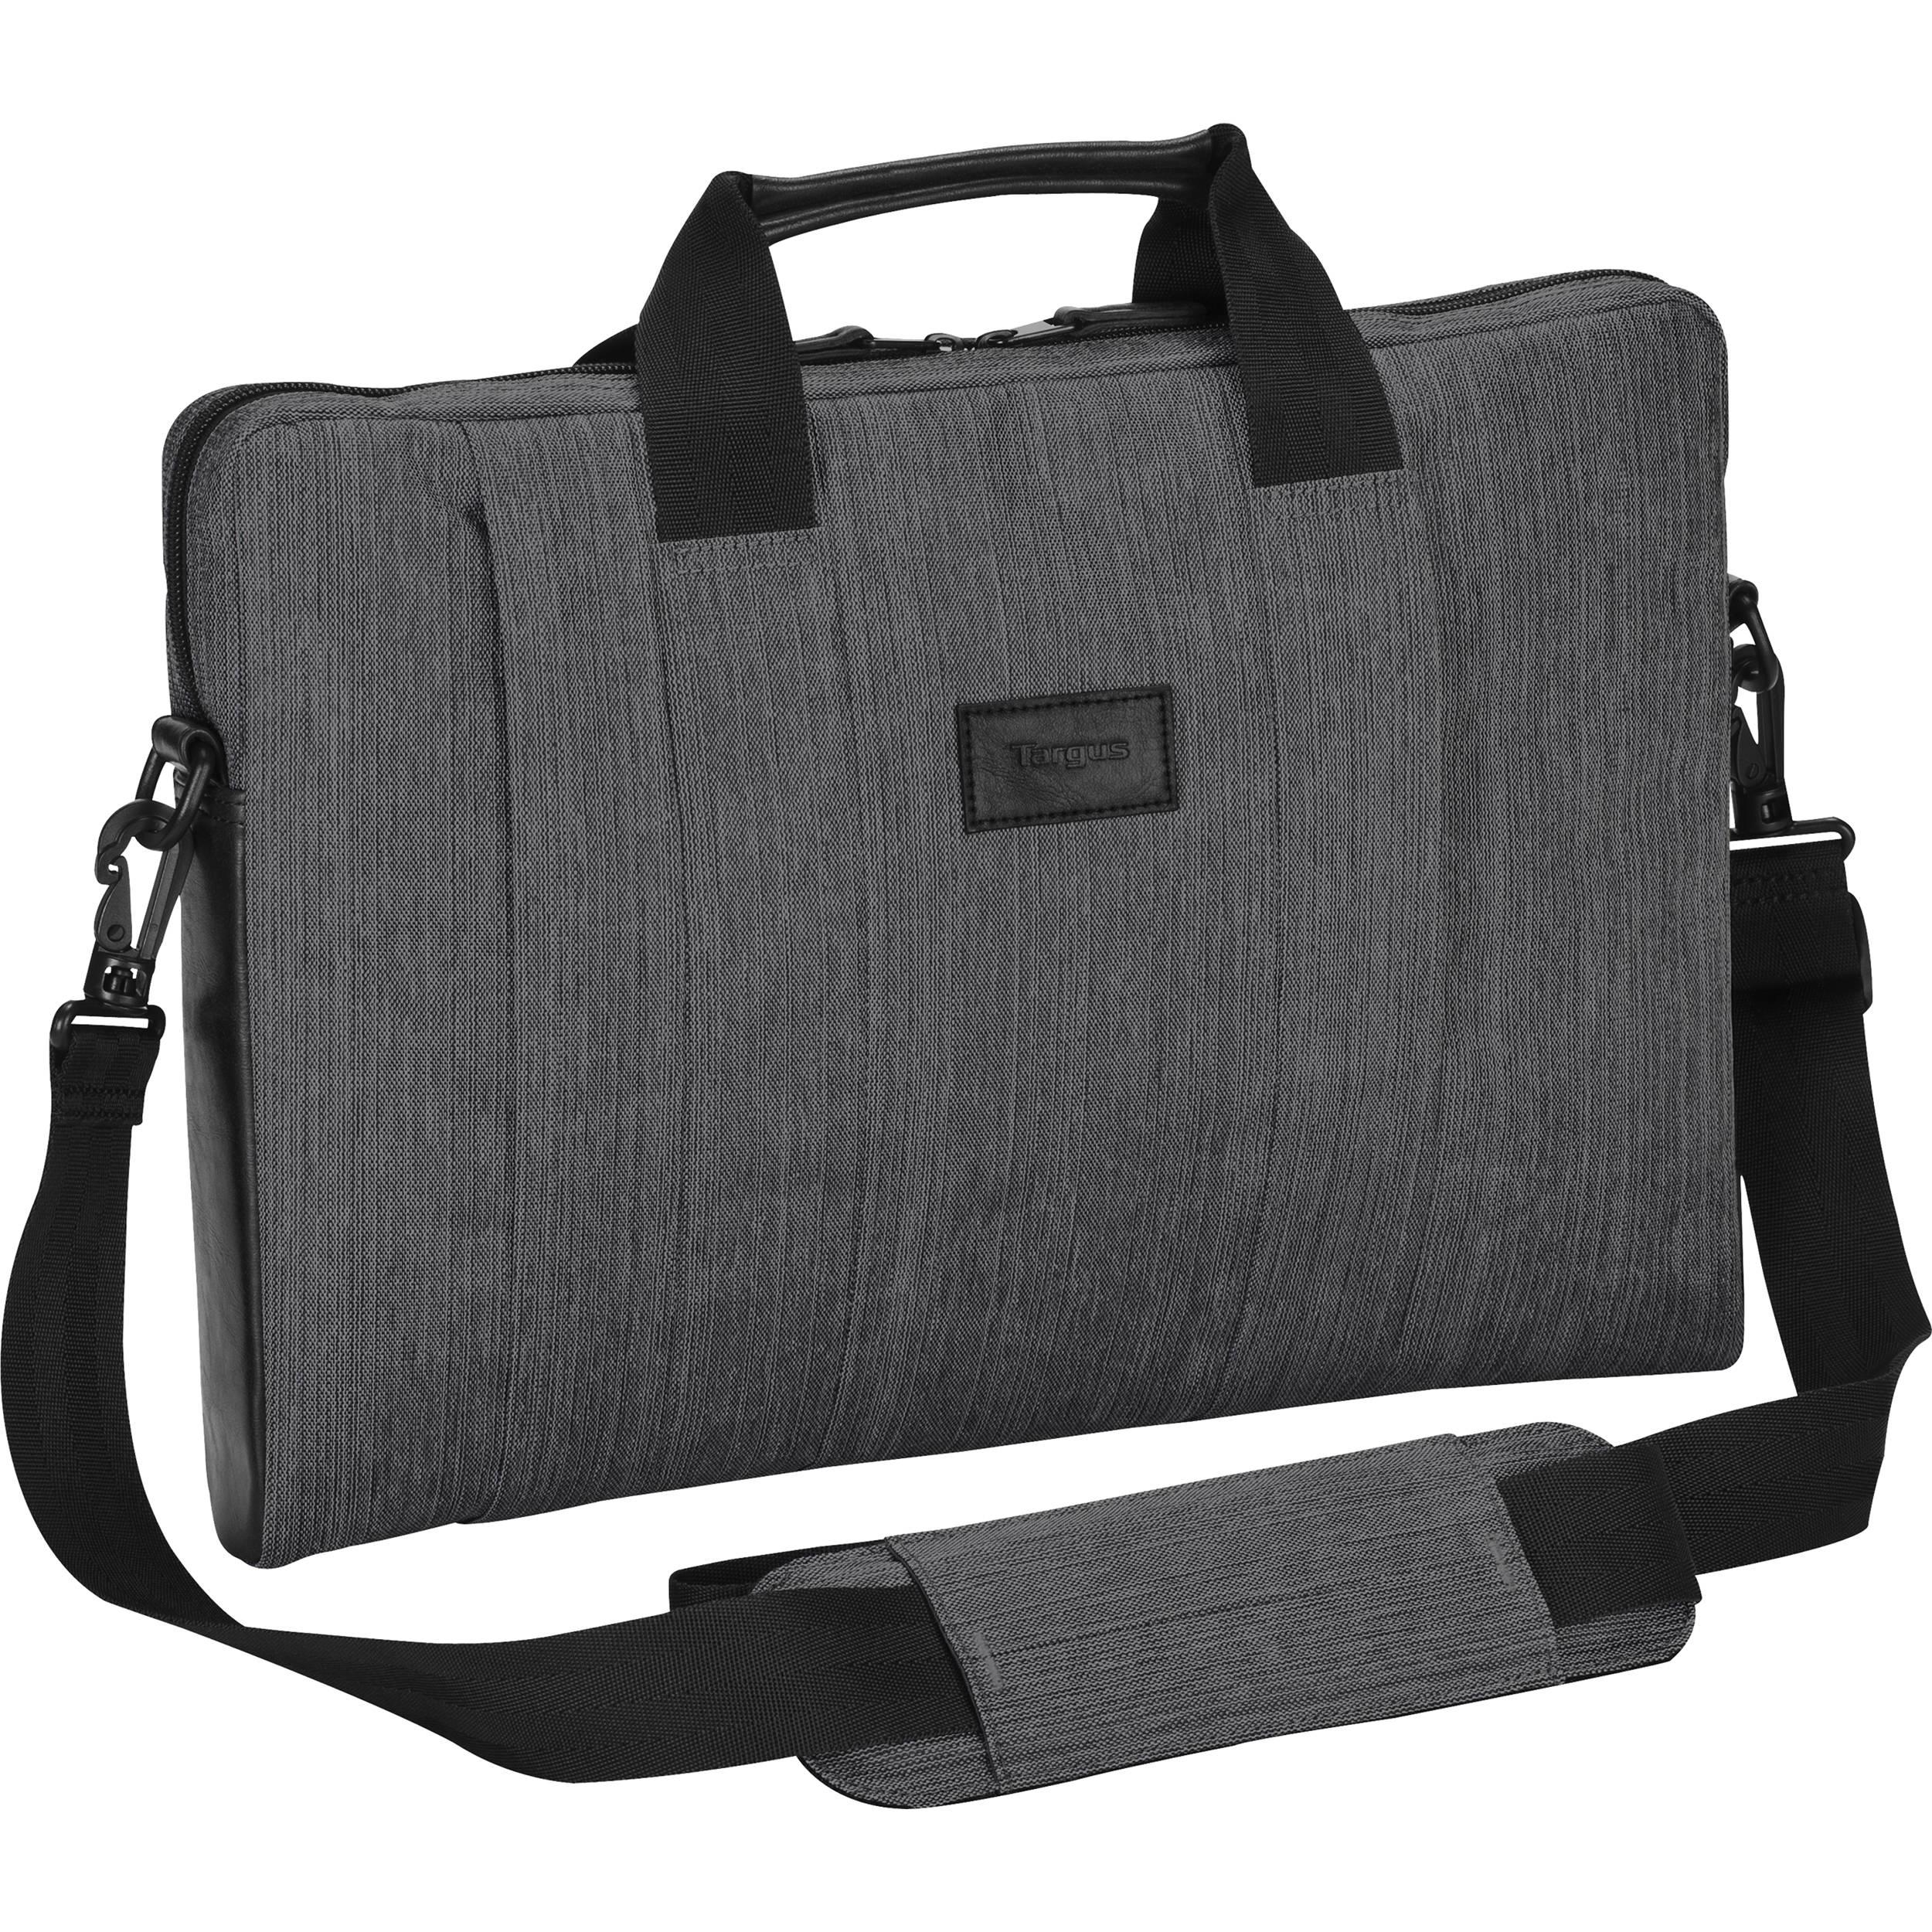 targus citysmart slipcase sleeve with strap tss59404us b h photo. Black Bedroom Furniture Sets. Home Design Ideas